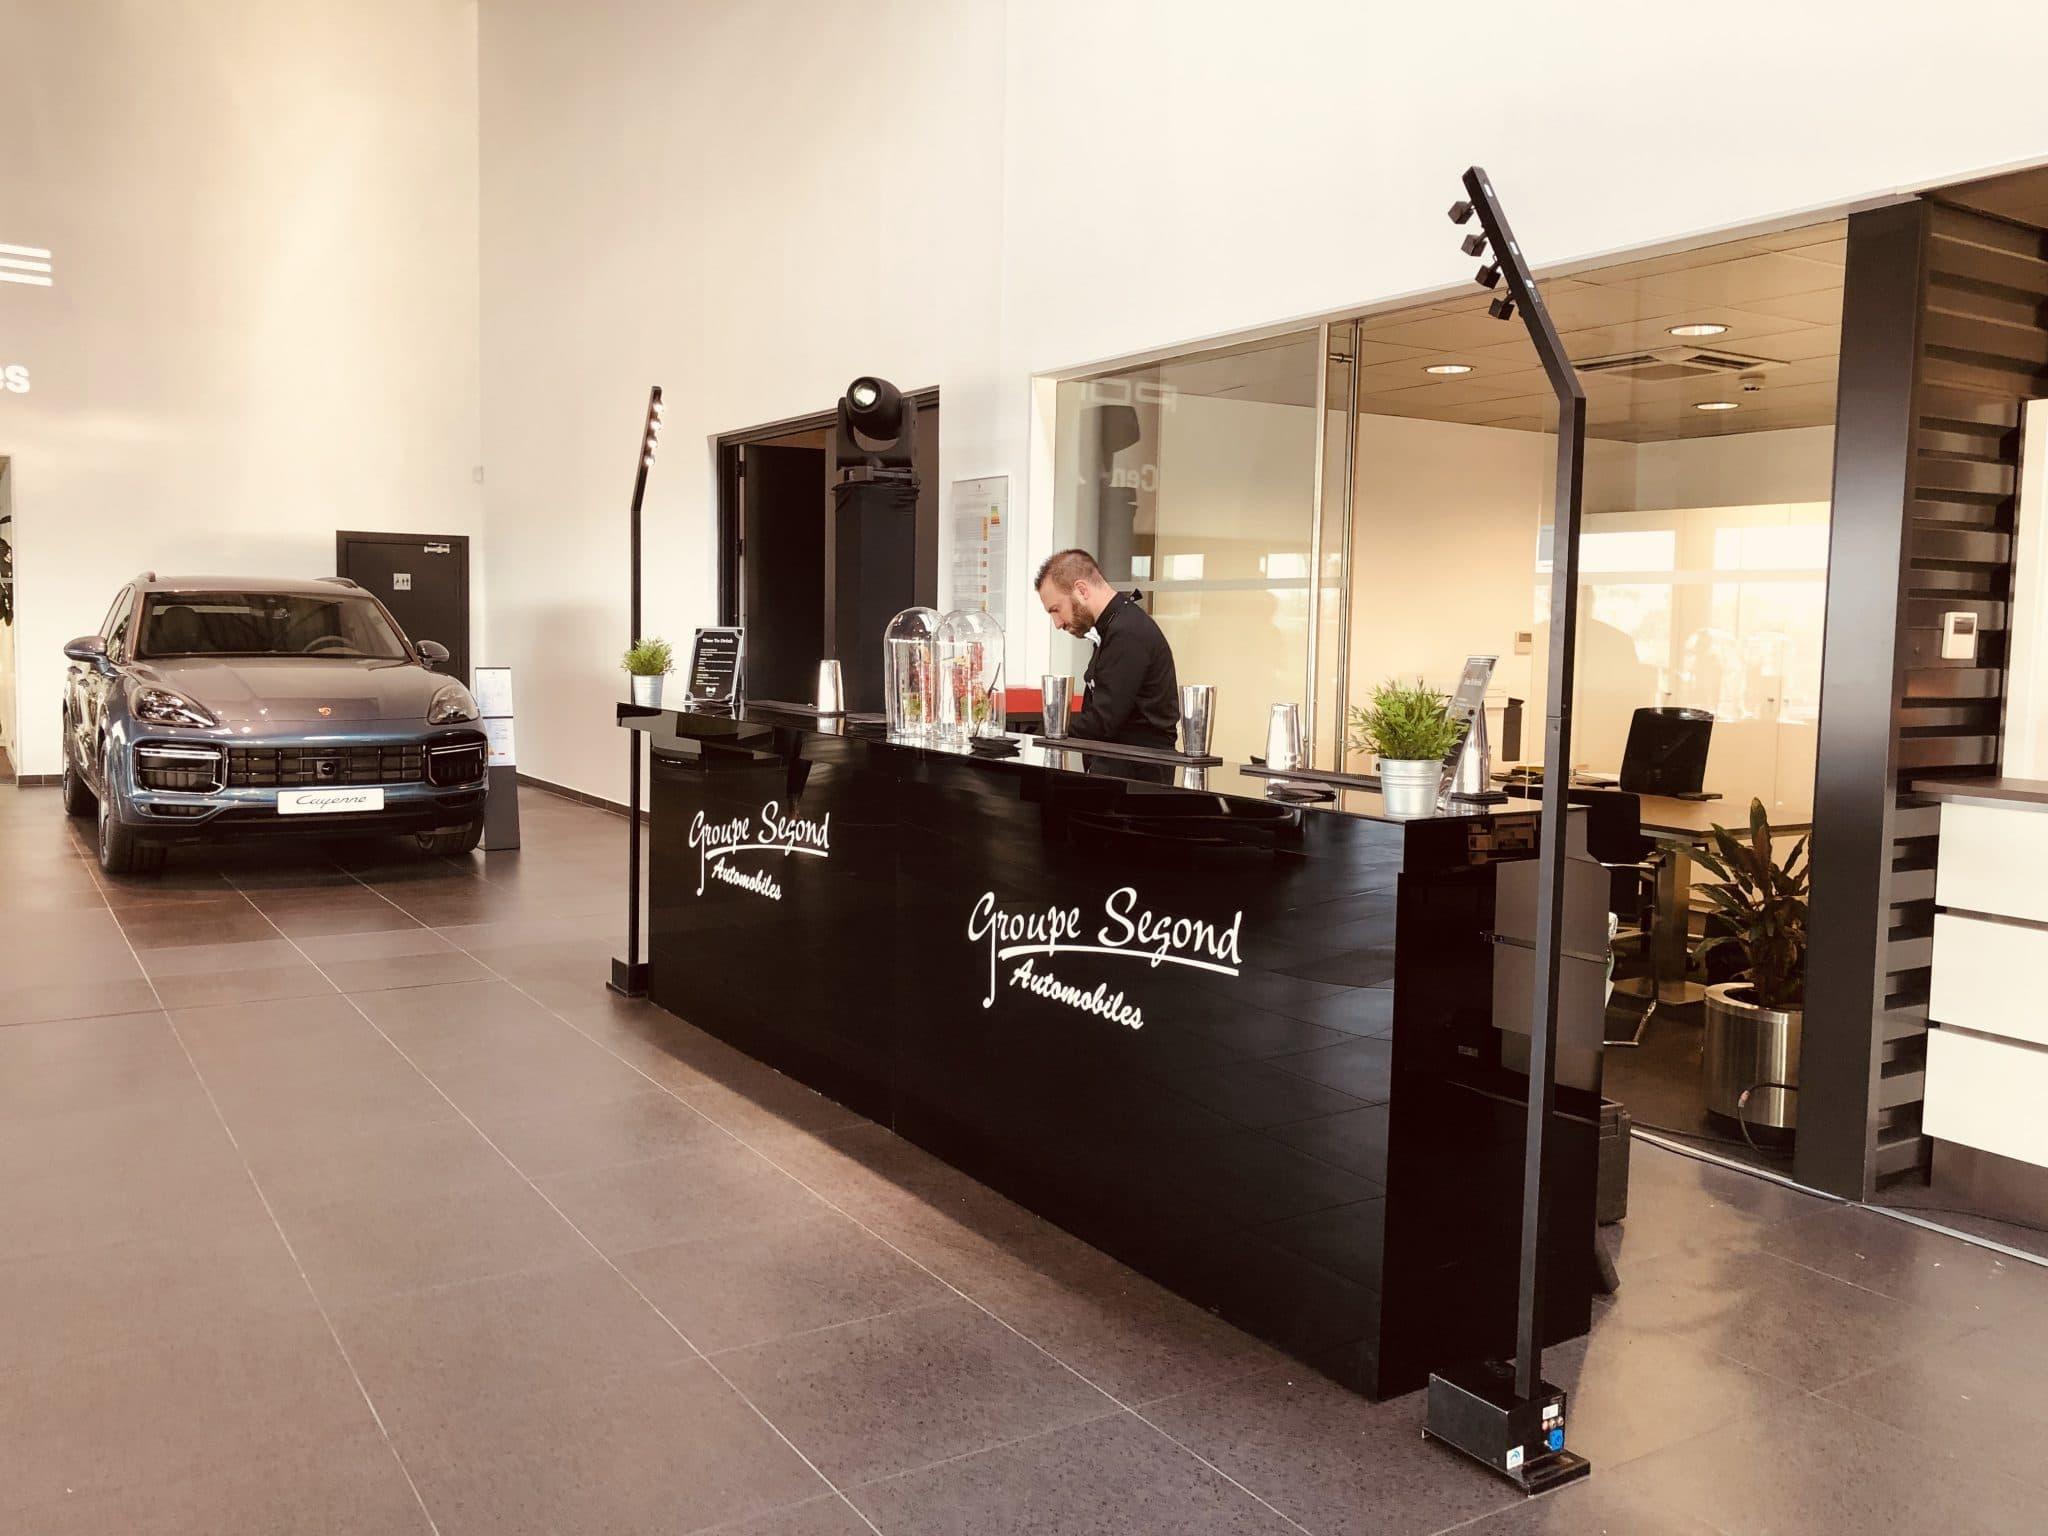 Porsche Segond Bar instant Events